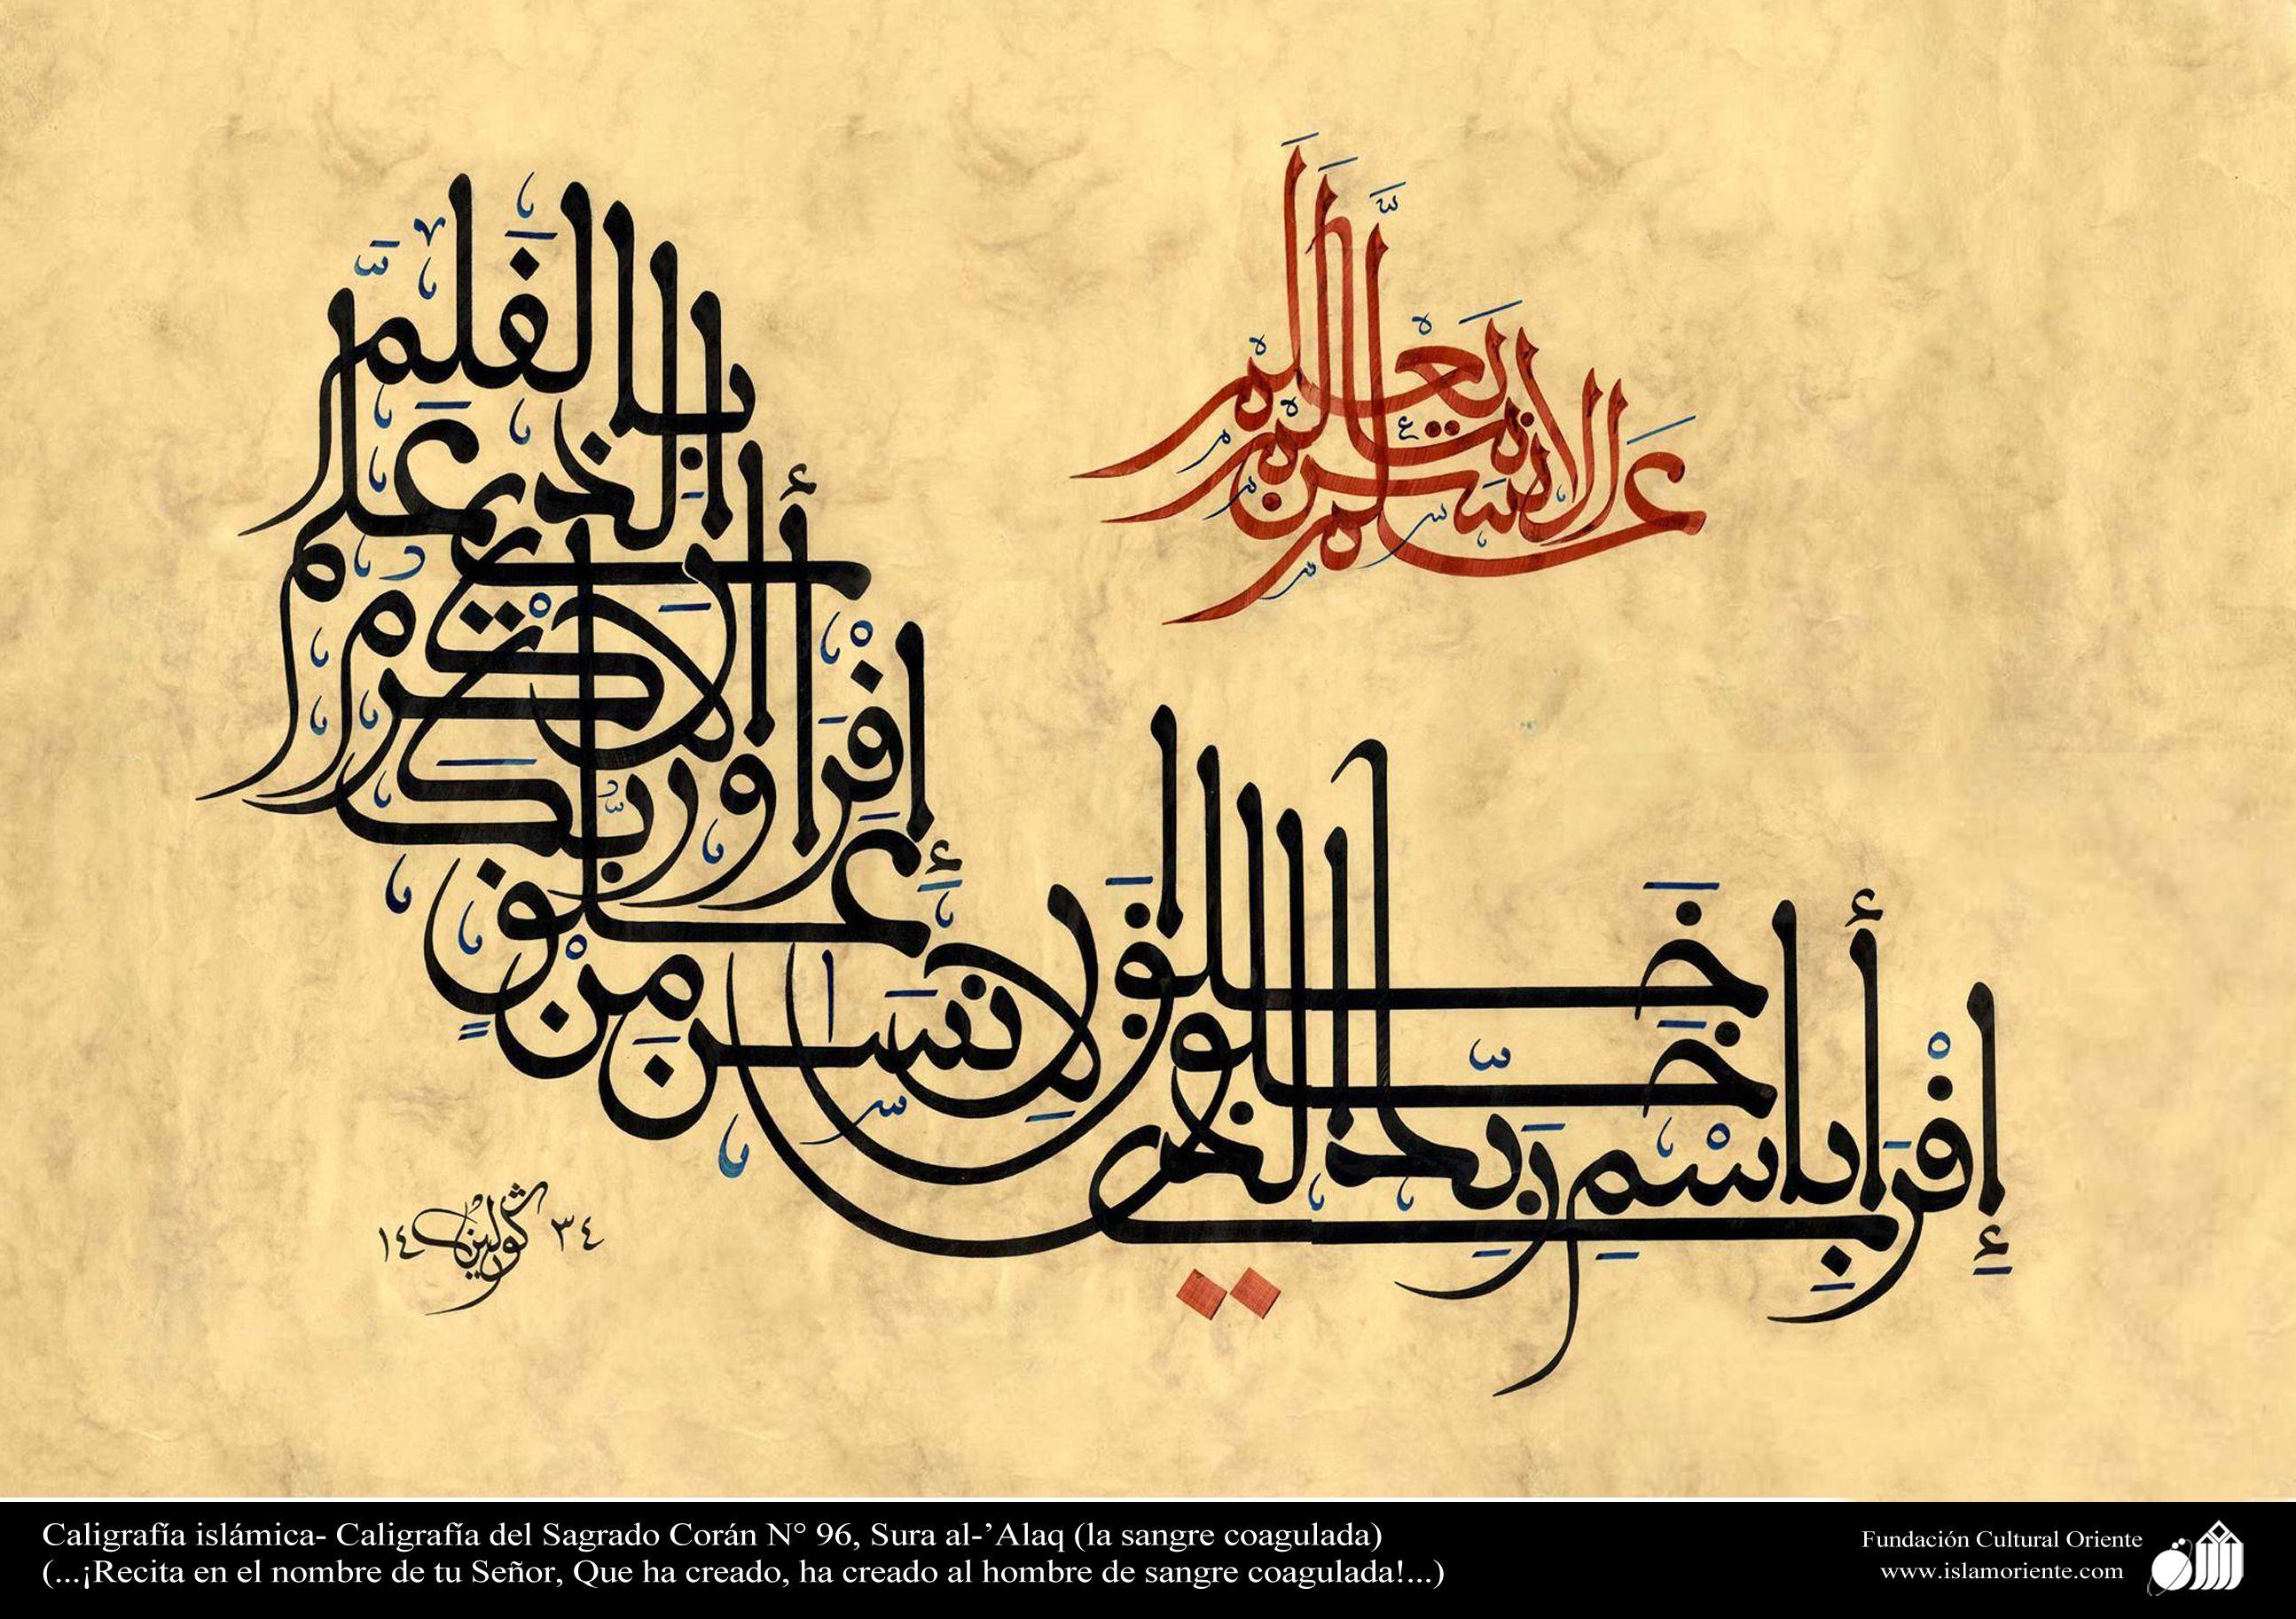 Caligrafia Islamica Caligrafia Del Sagrado Coran N 96 Sura Al Alaq La Sangre Coagulada Arabic Calligraphy Artwork Calligraphy Art Islamic Art Calligraphy